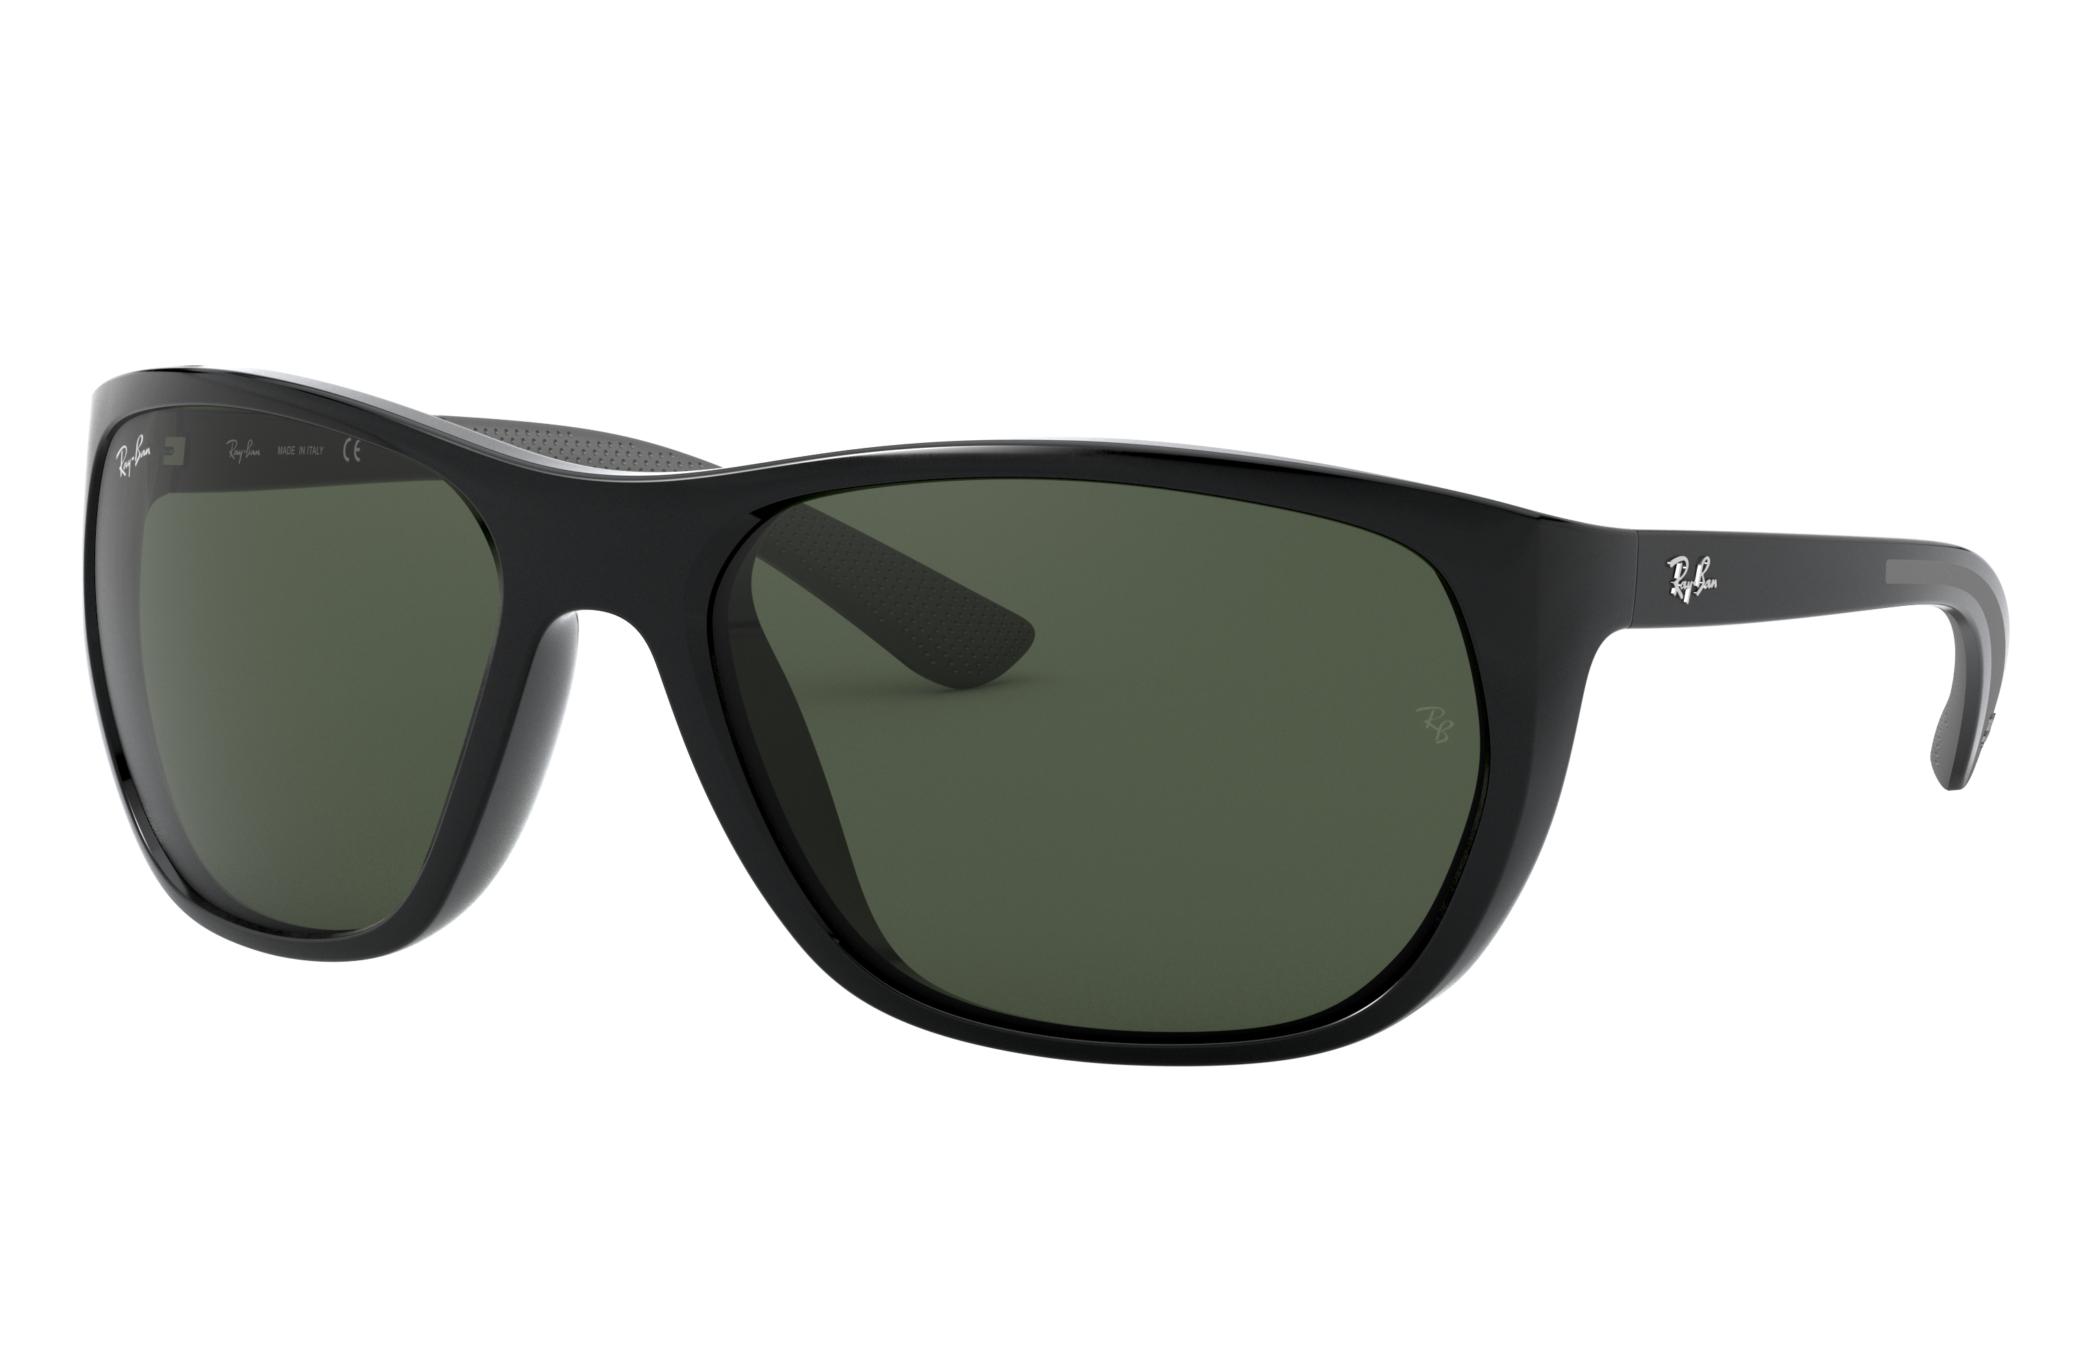 Ray-Ban Rb4307 Black, Green Lenses - RB4307